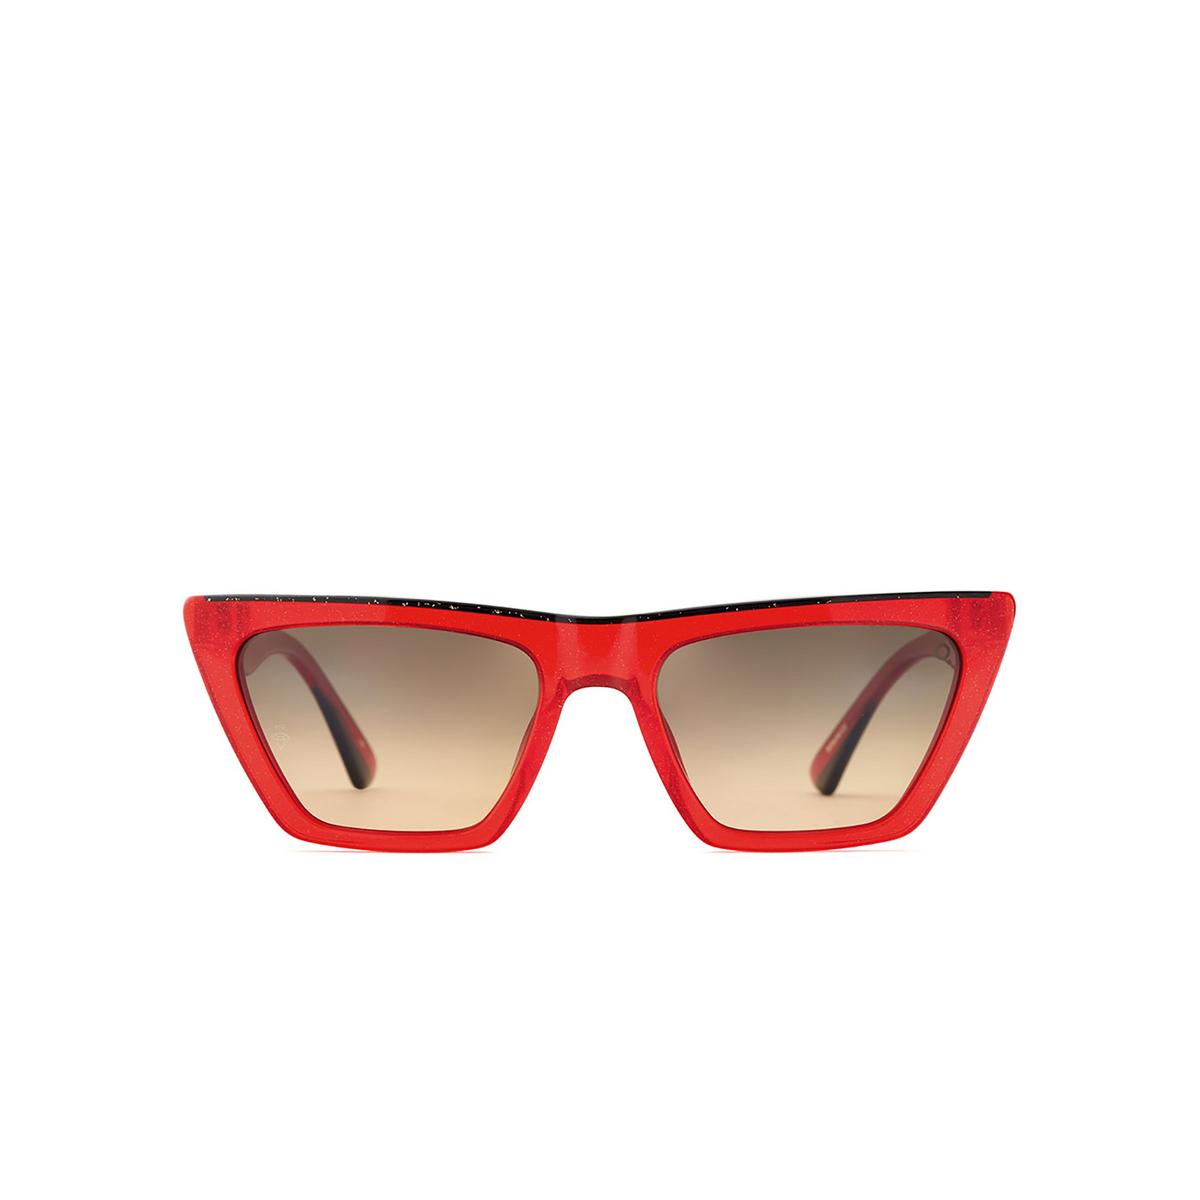 Etnia Barcelona® Square Sunglasses: Walo color Rdbk.